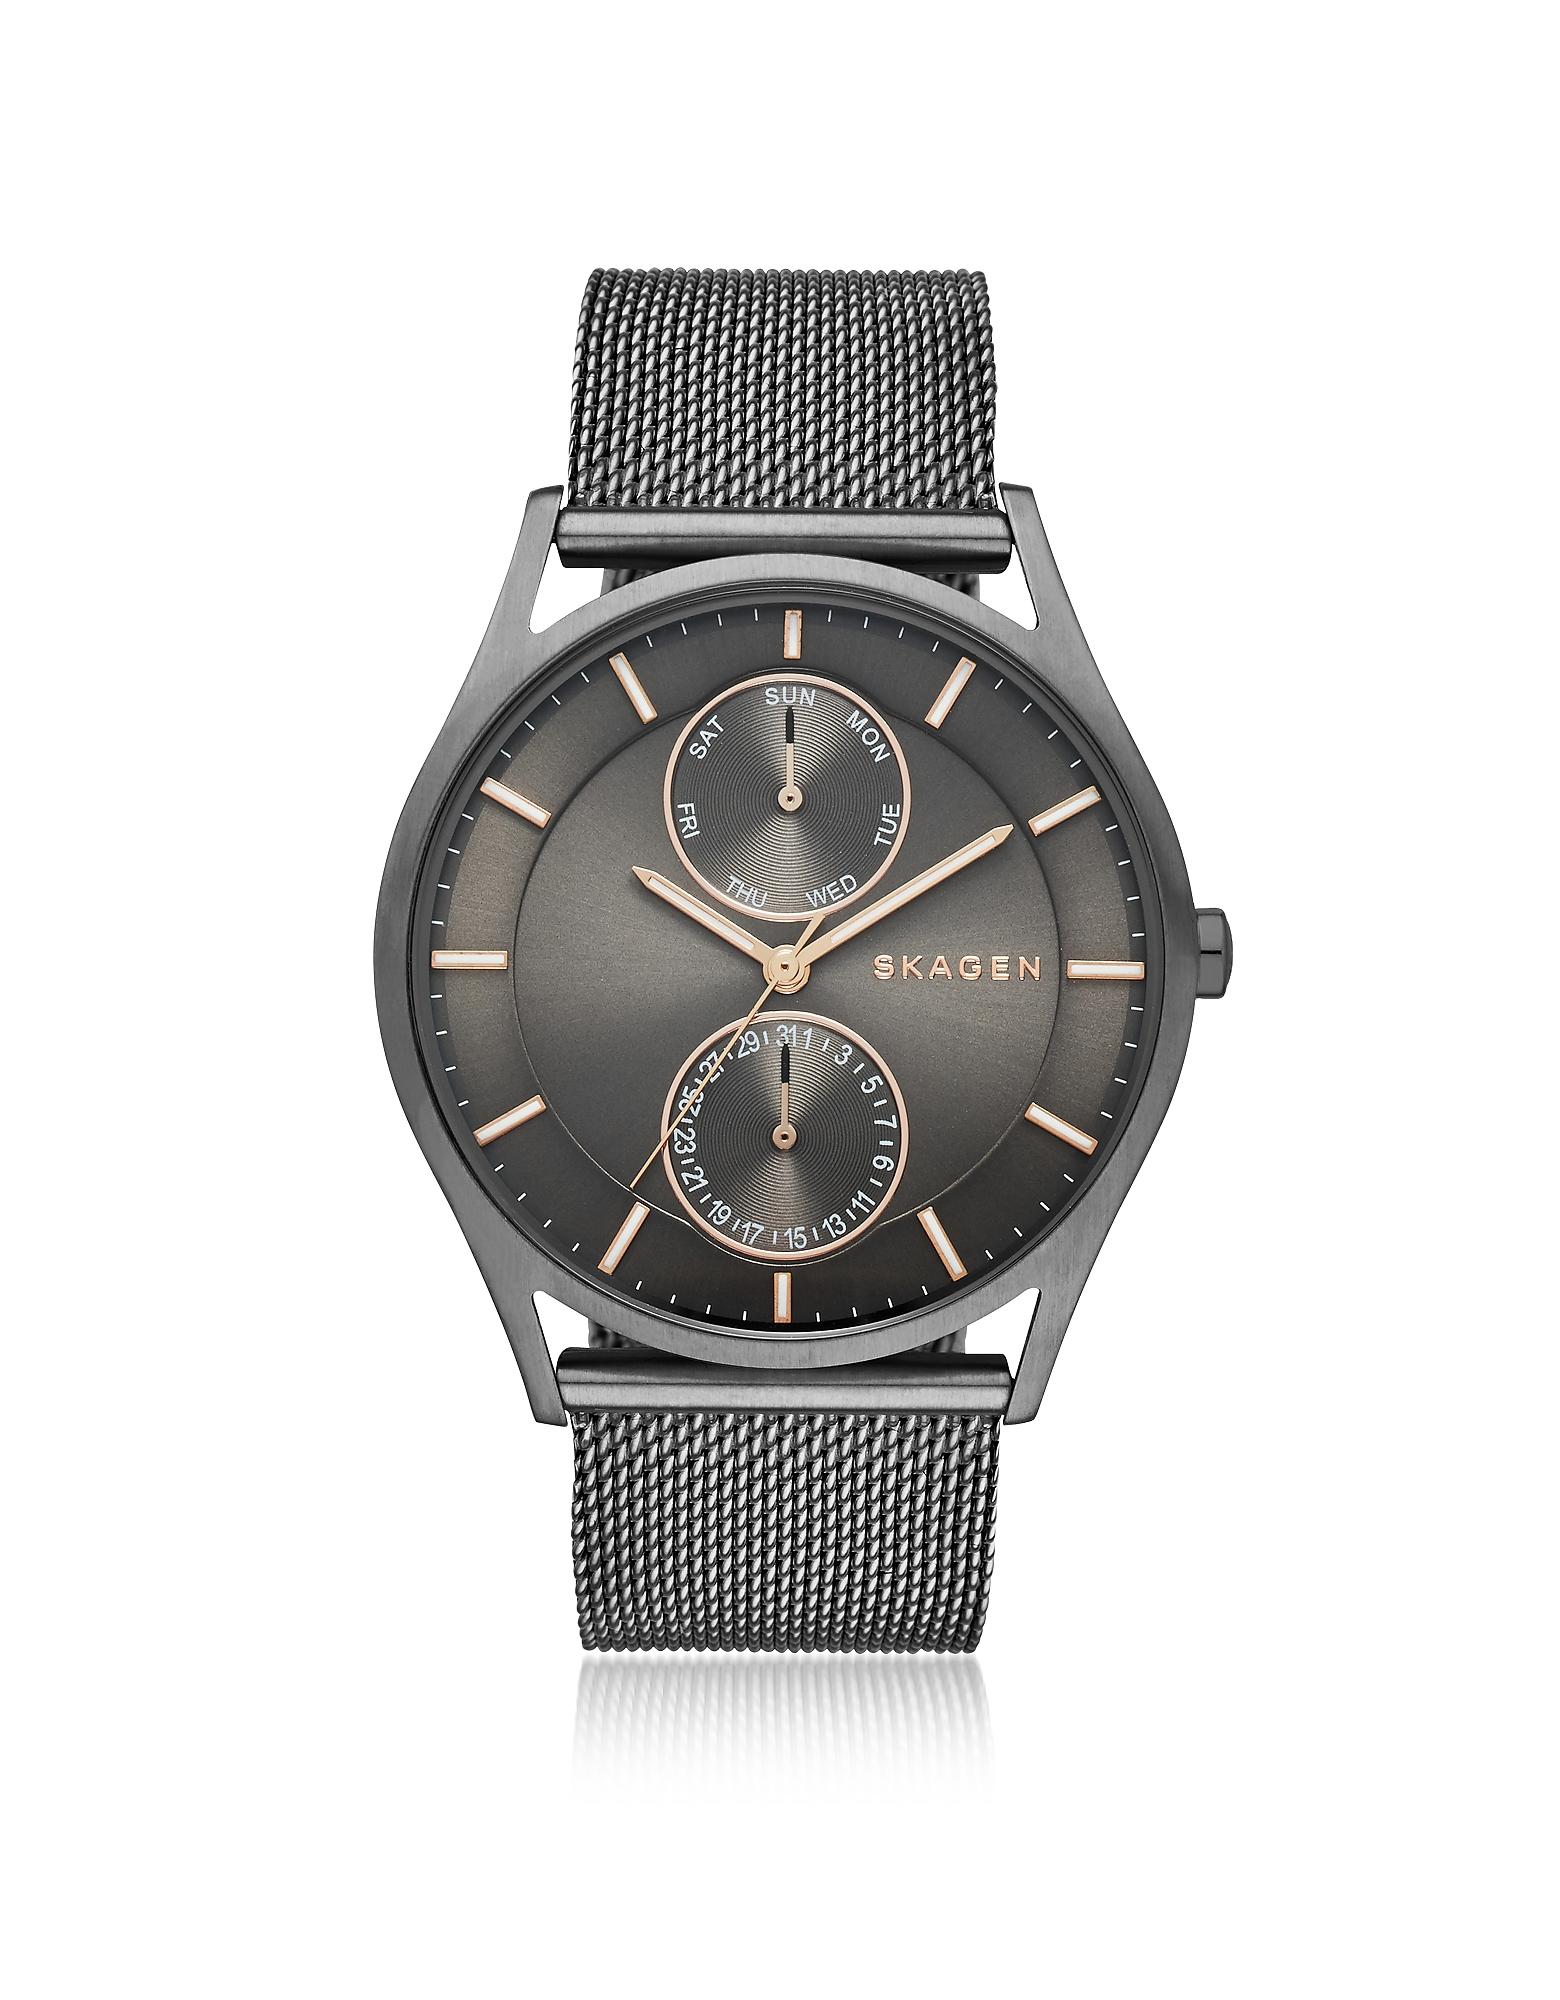 Skagen Men's Watches, Holst Gray Stainless Steel Men's Watch w/Mesh Band